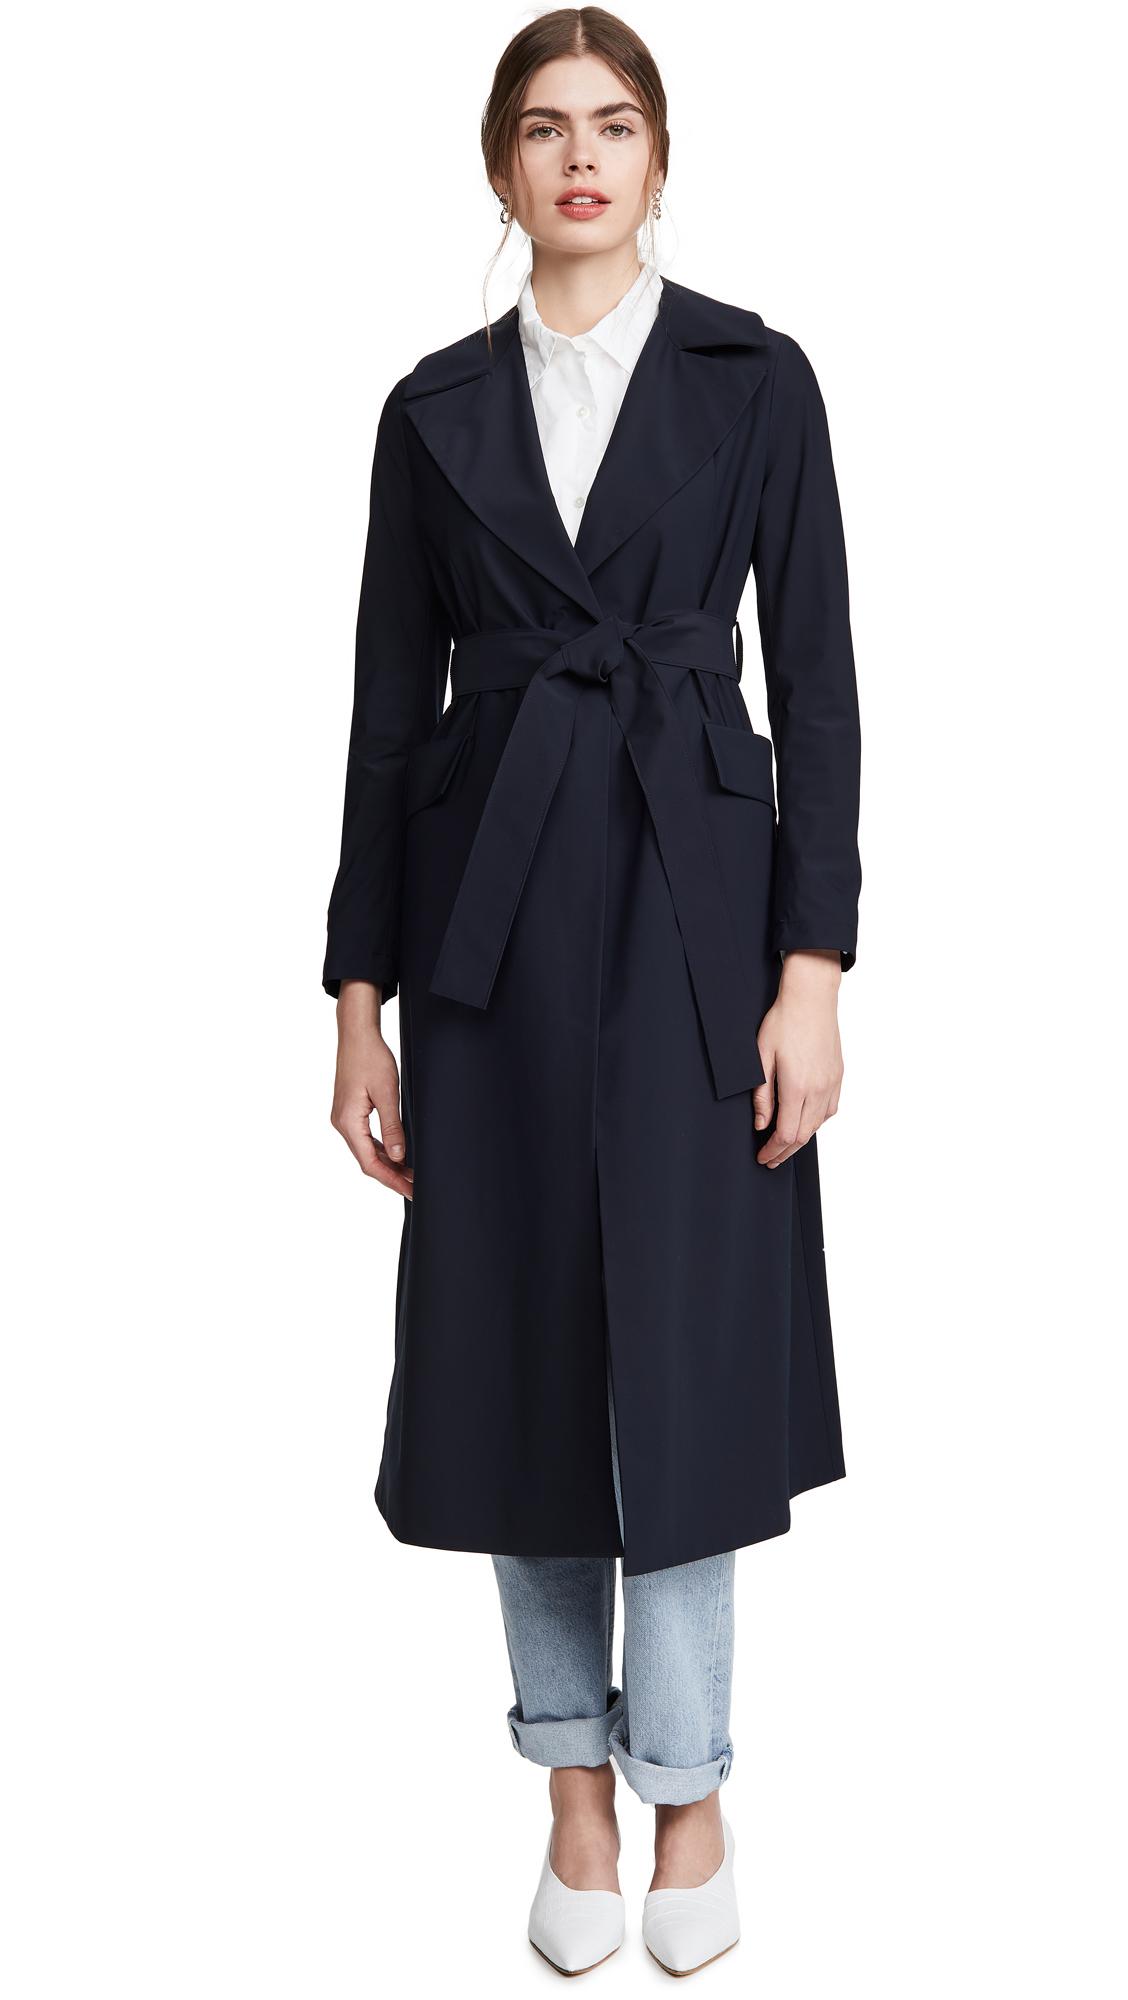 Buy Harris Wharf London Flap Pocket Duster Coat online beautiful Harris Wharf London Clothing, Jackets